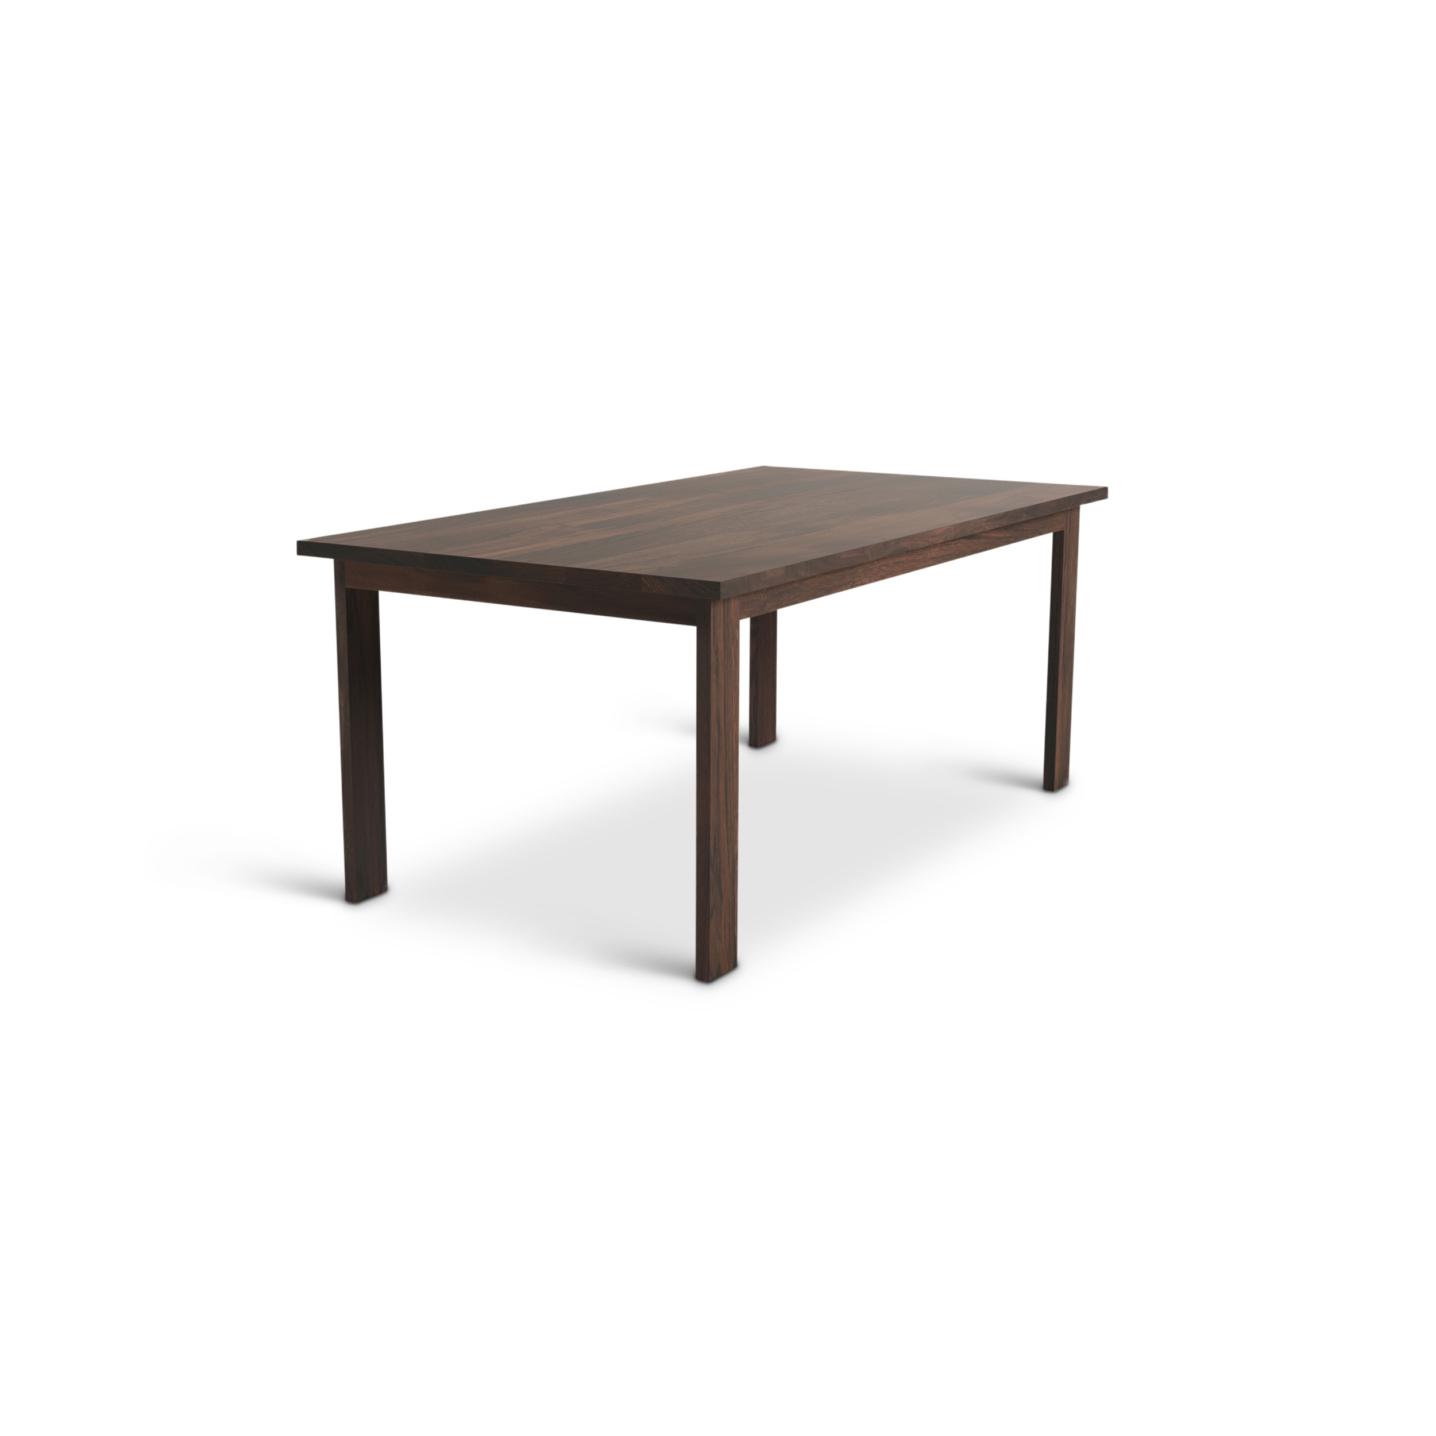 Simple but Modern Walnut Table